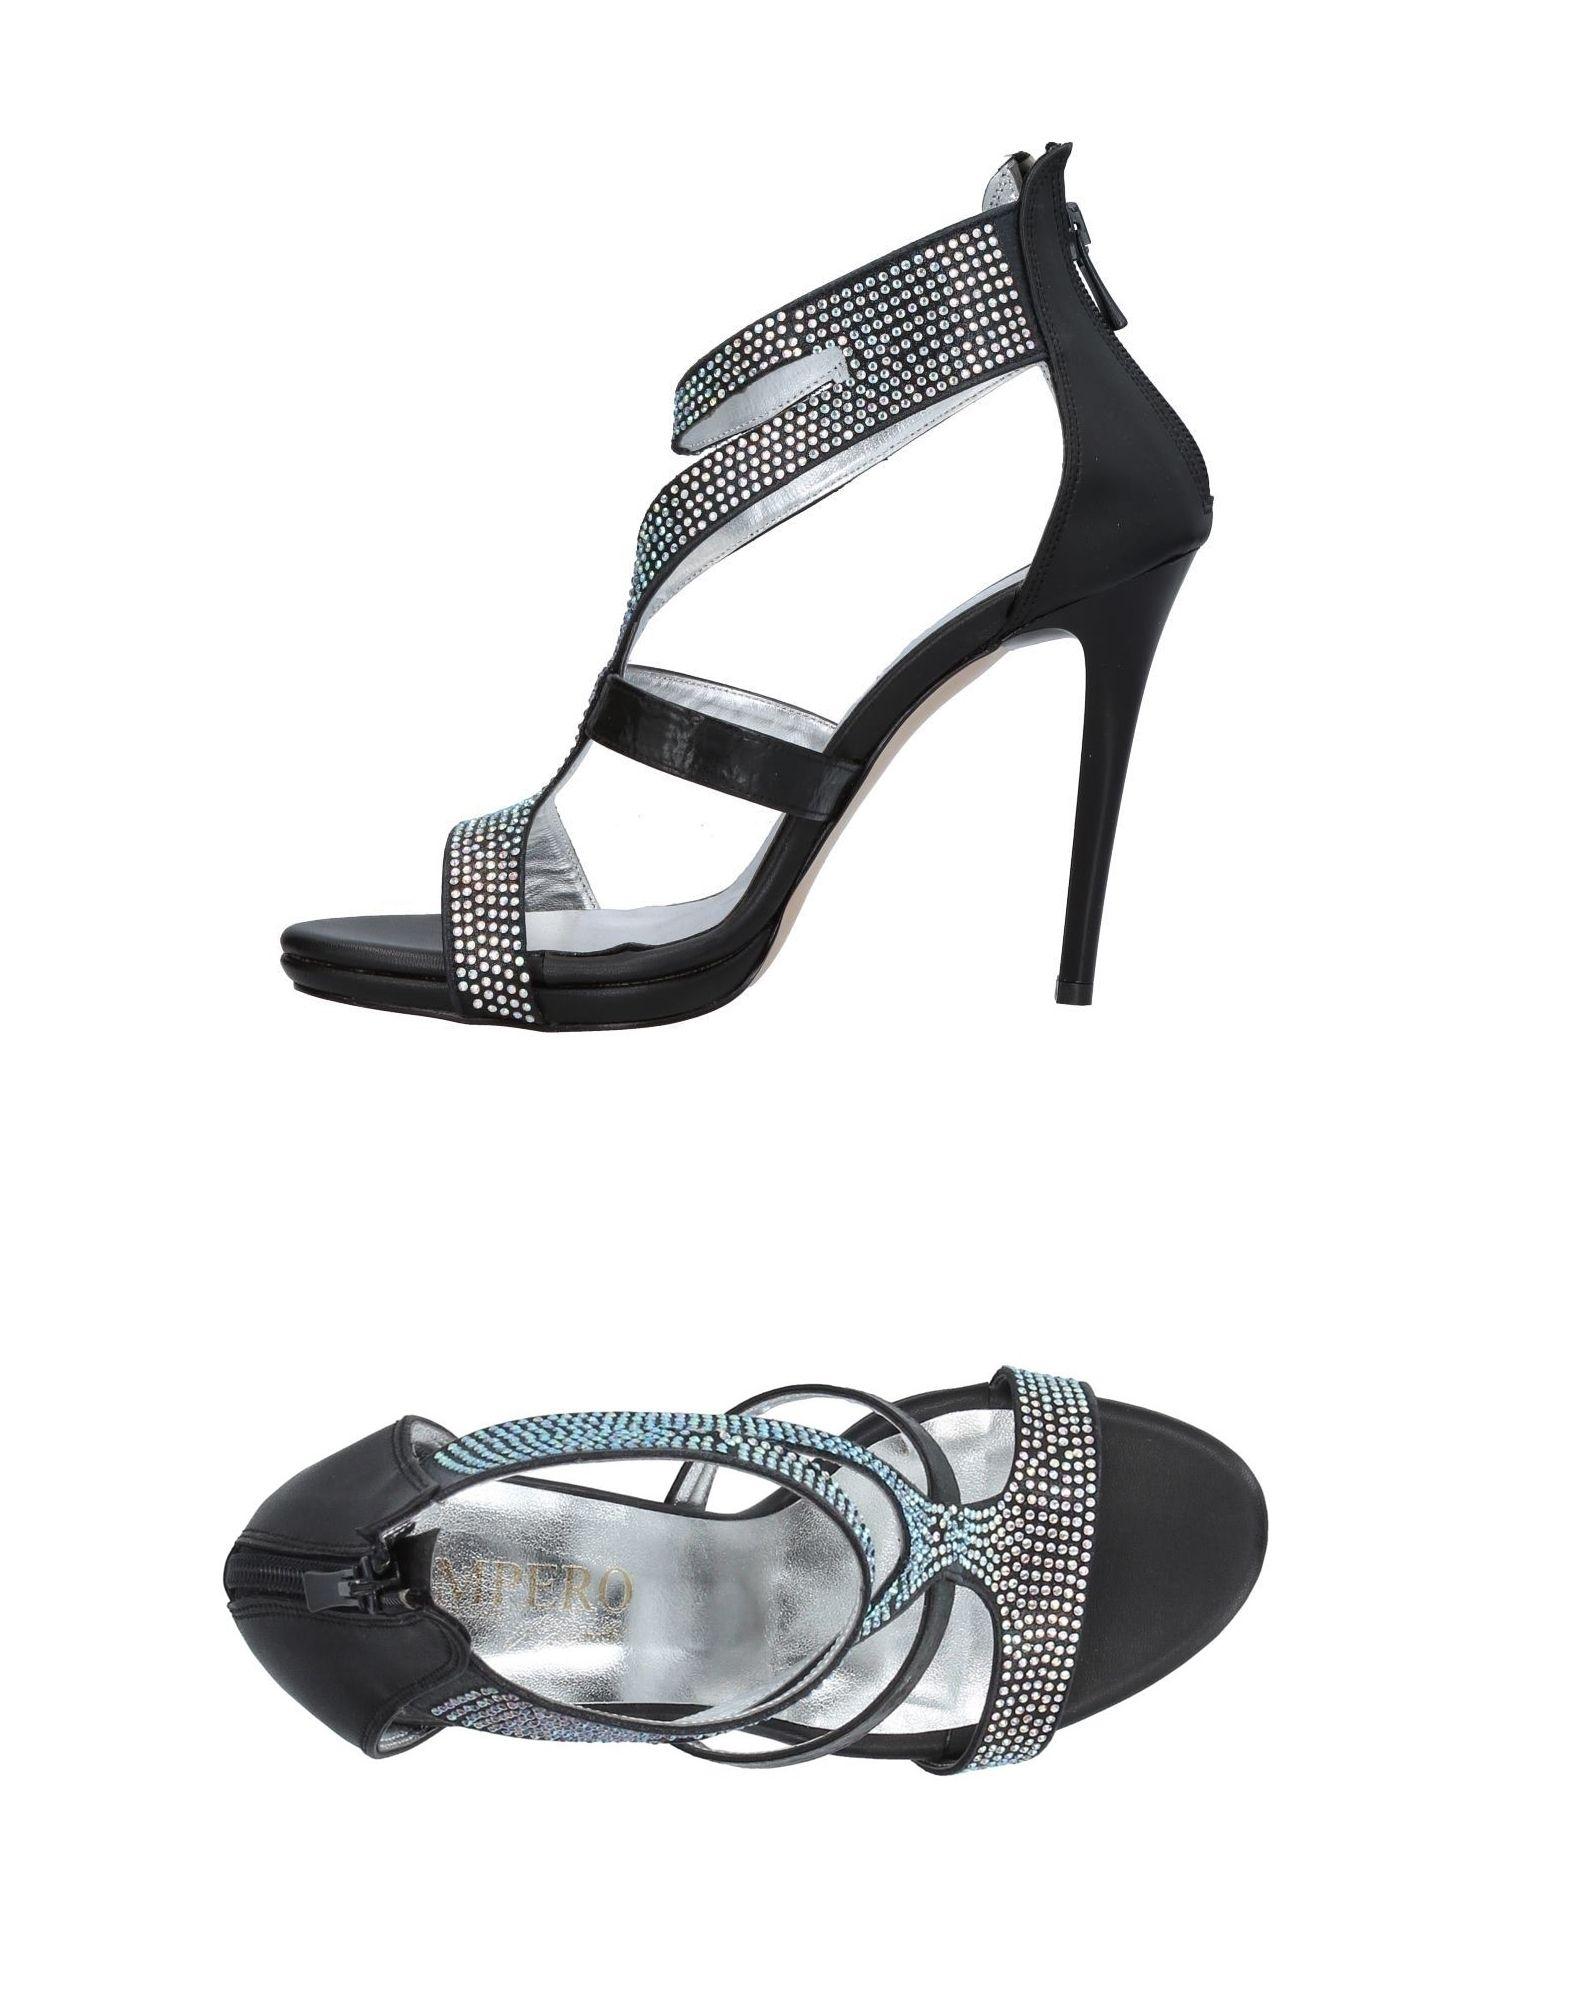 Sandales Impero Couture Femme - Sandales Impero Couture sur